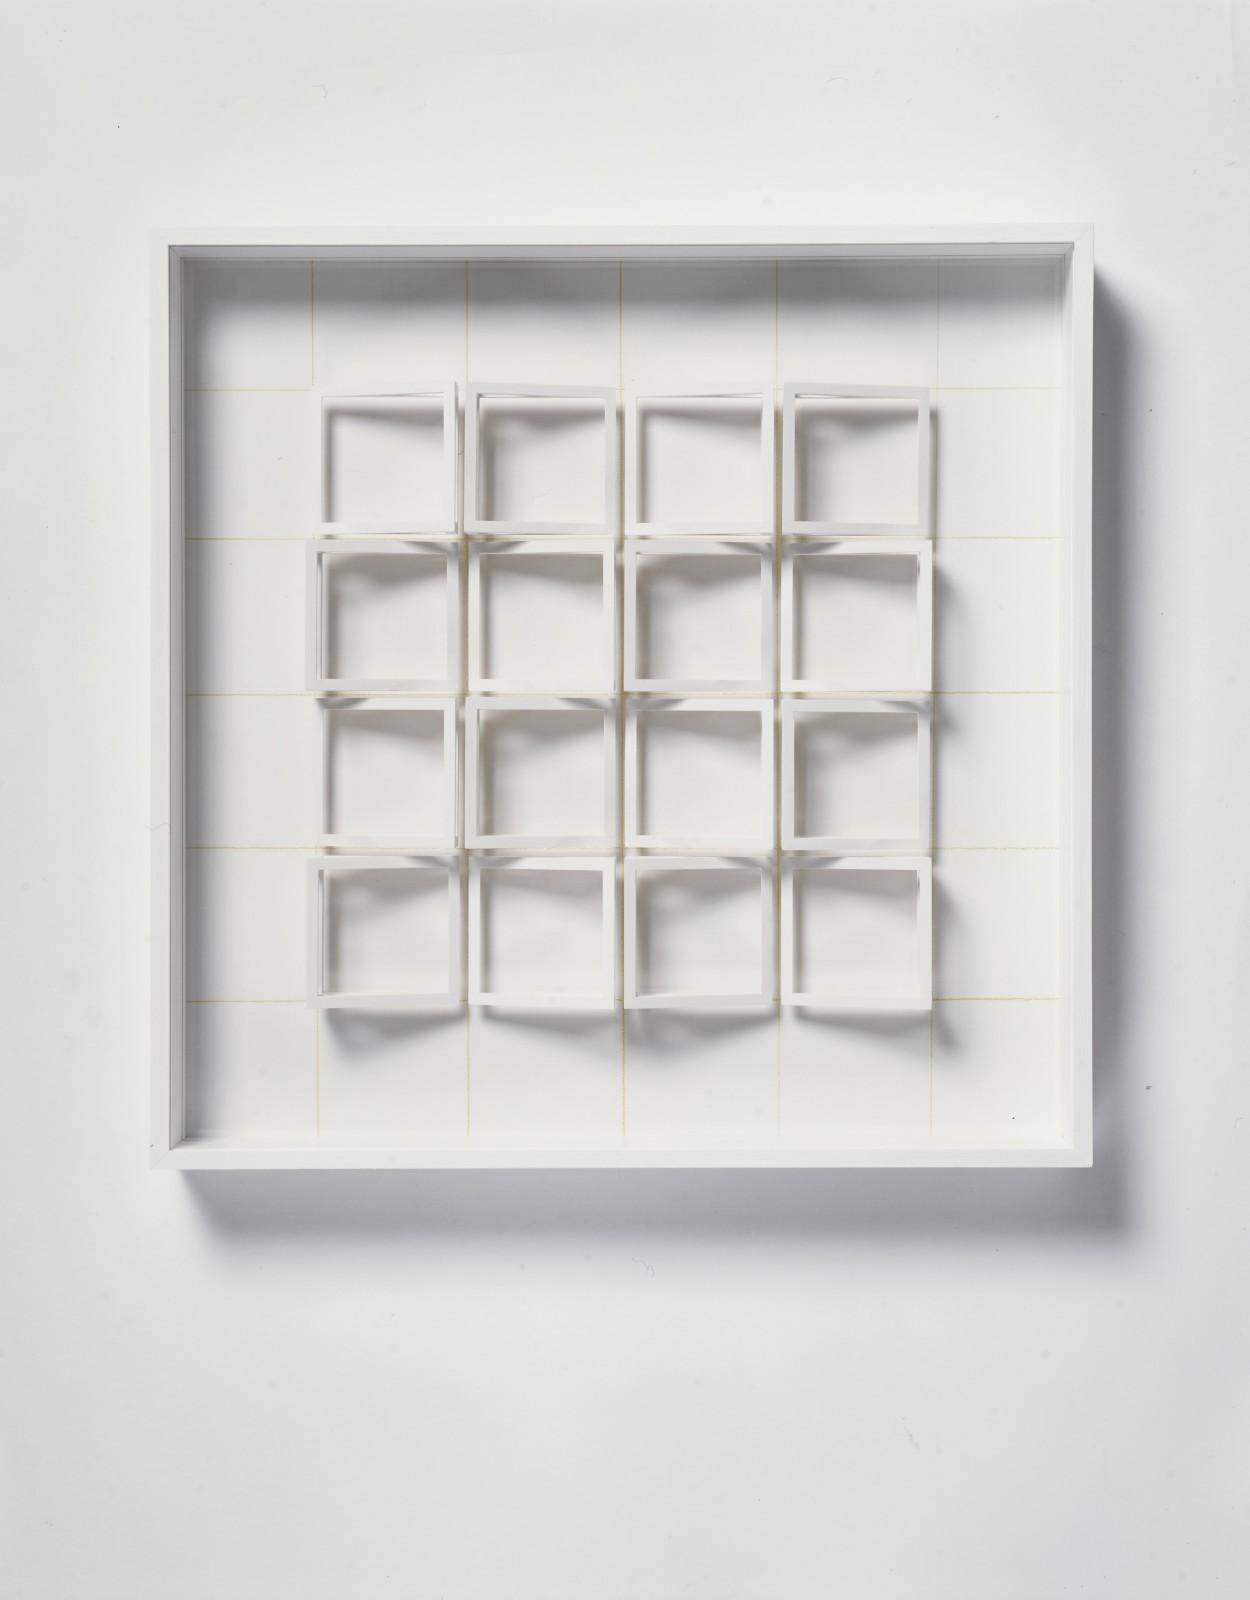 KLAUS STAUDT, Domus, 2004 Wood, acrylic paint, Plexiglas and coloured pencil 50 x 50 x 7 cm 19 ⅝ x 19 ⅝ x 2 ¾ inches Edition of 5